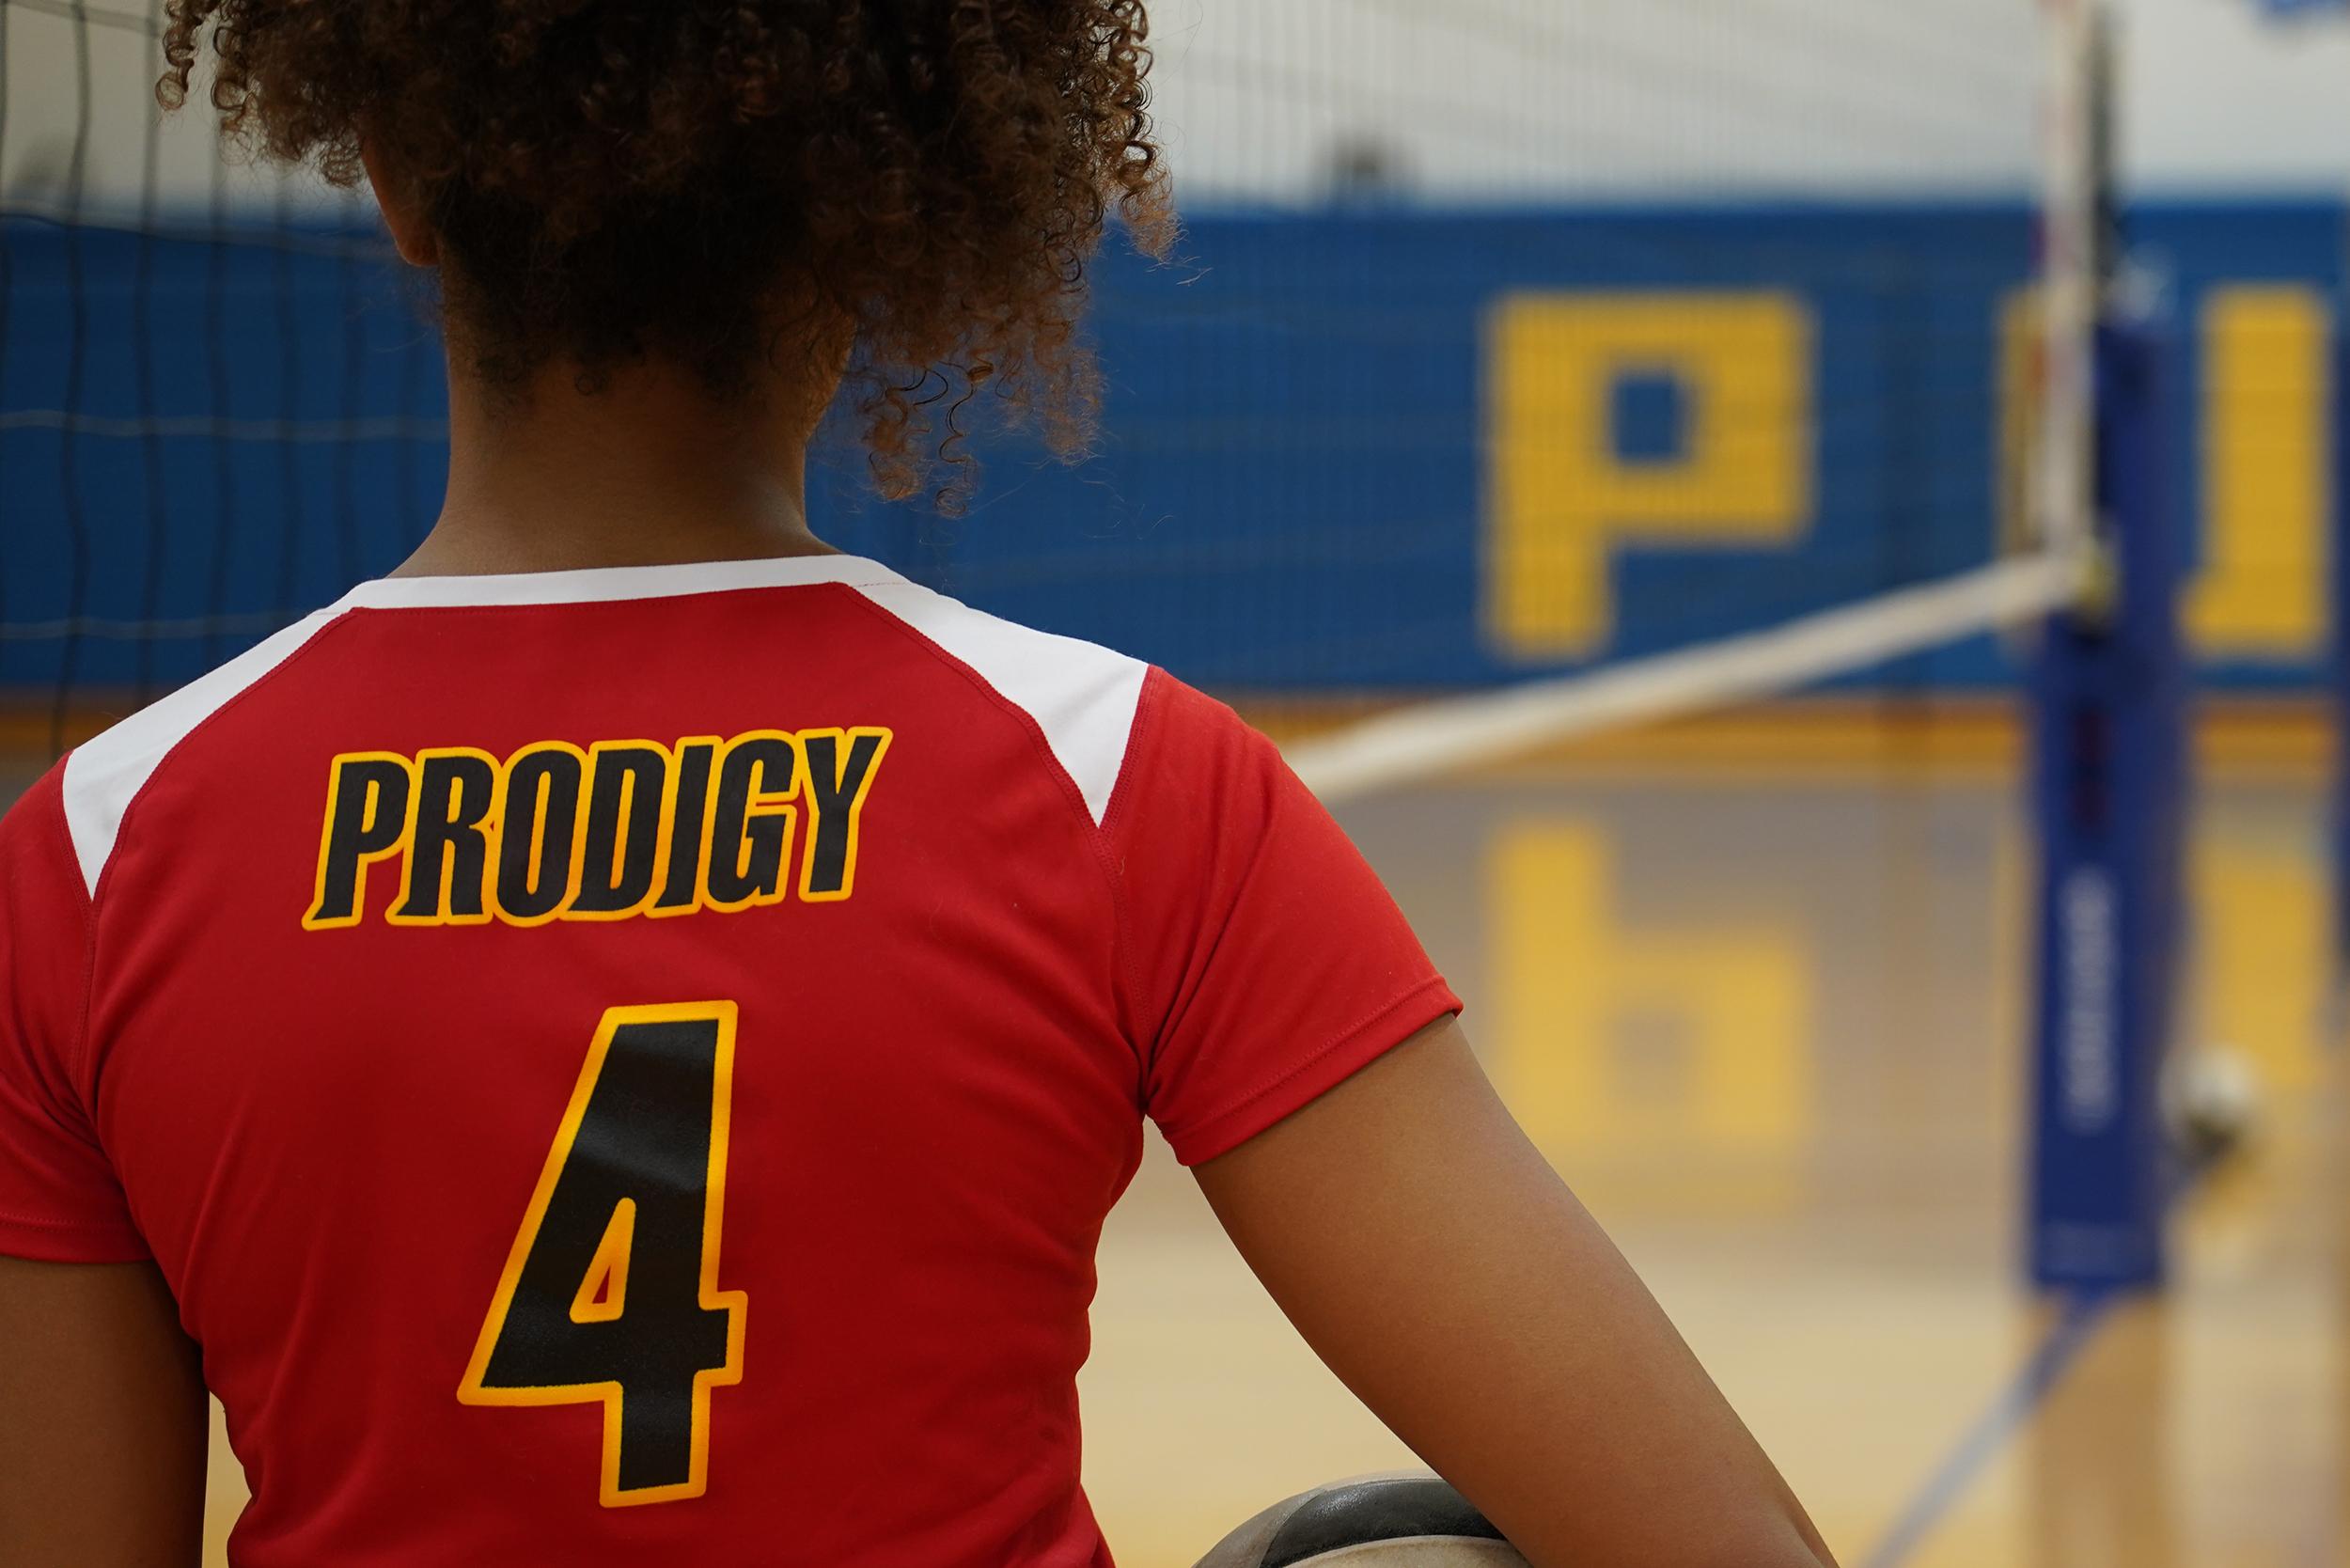 Prodigy Volleyball